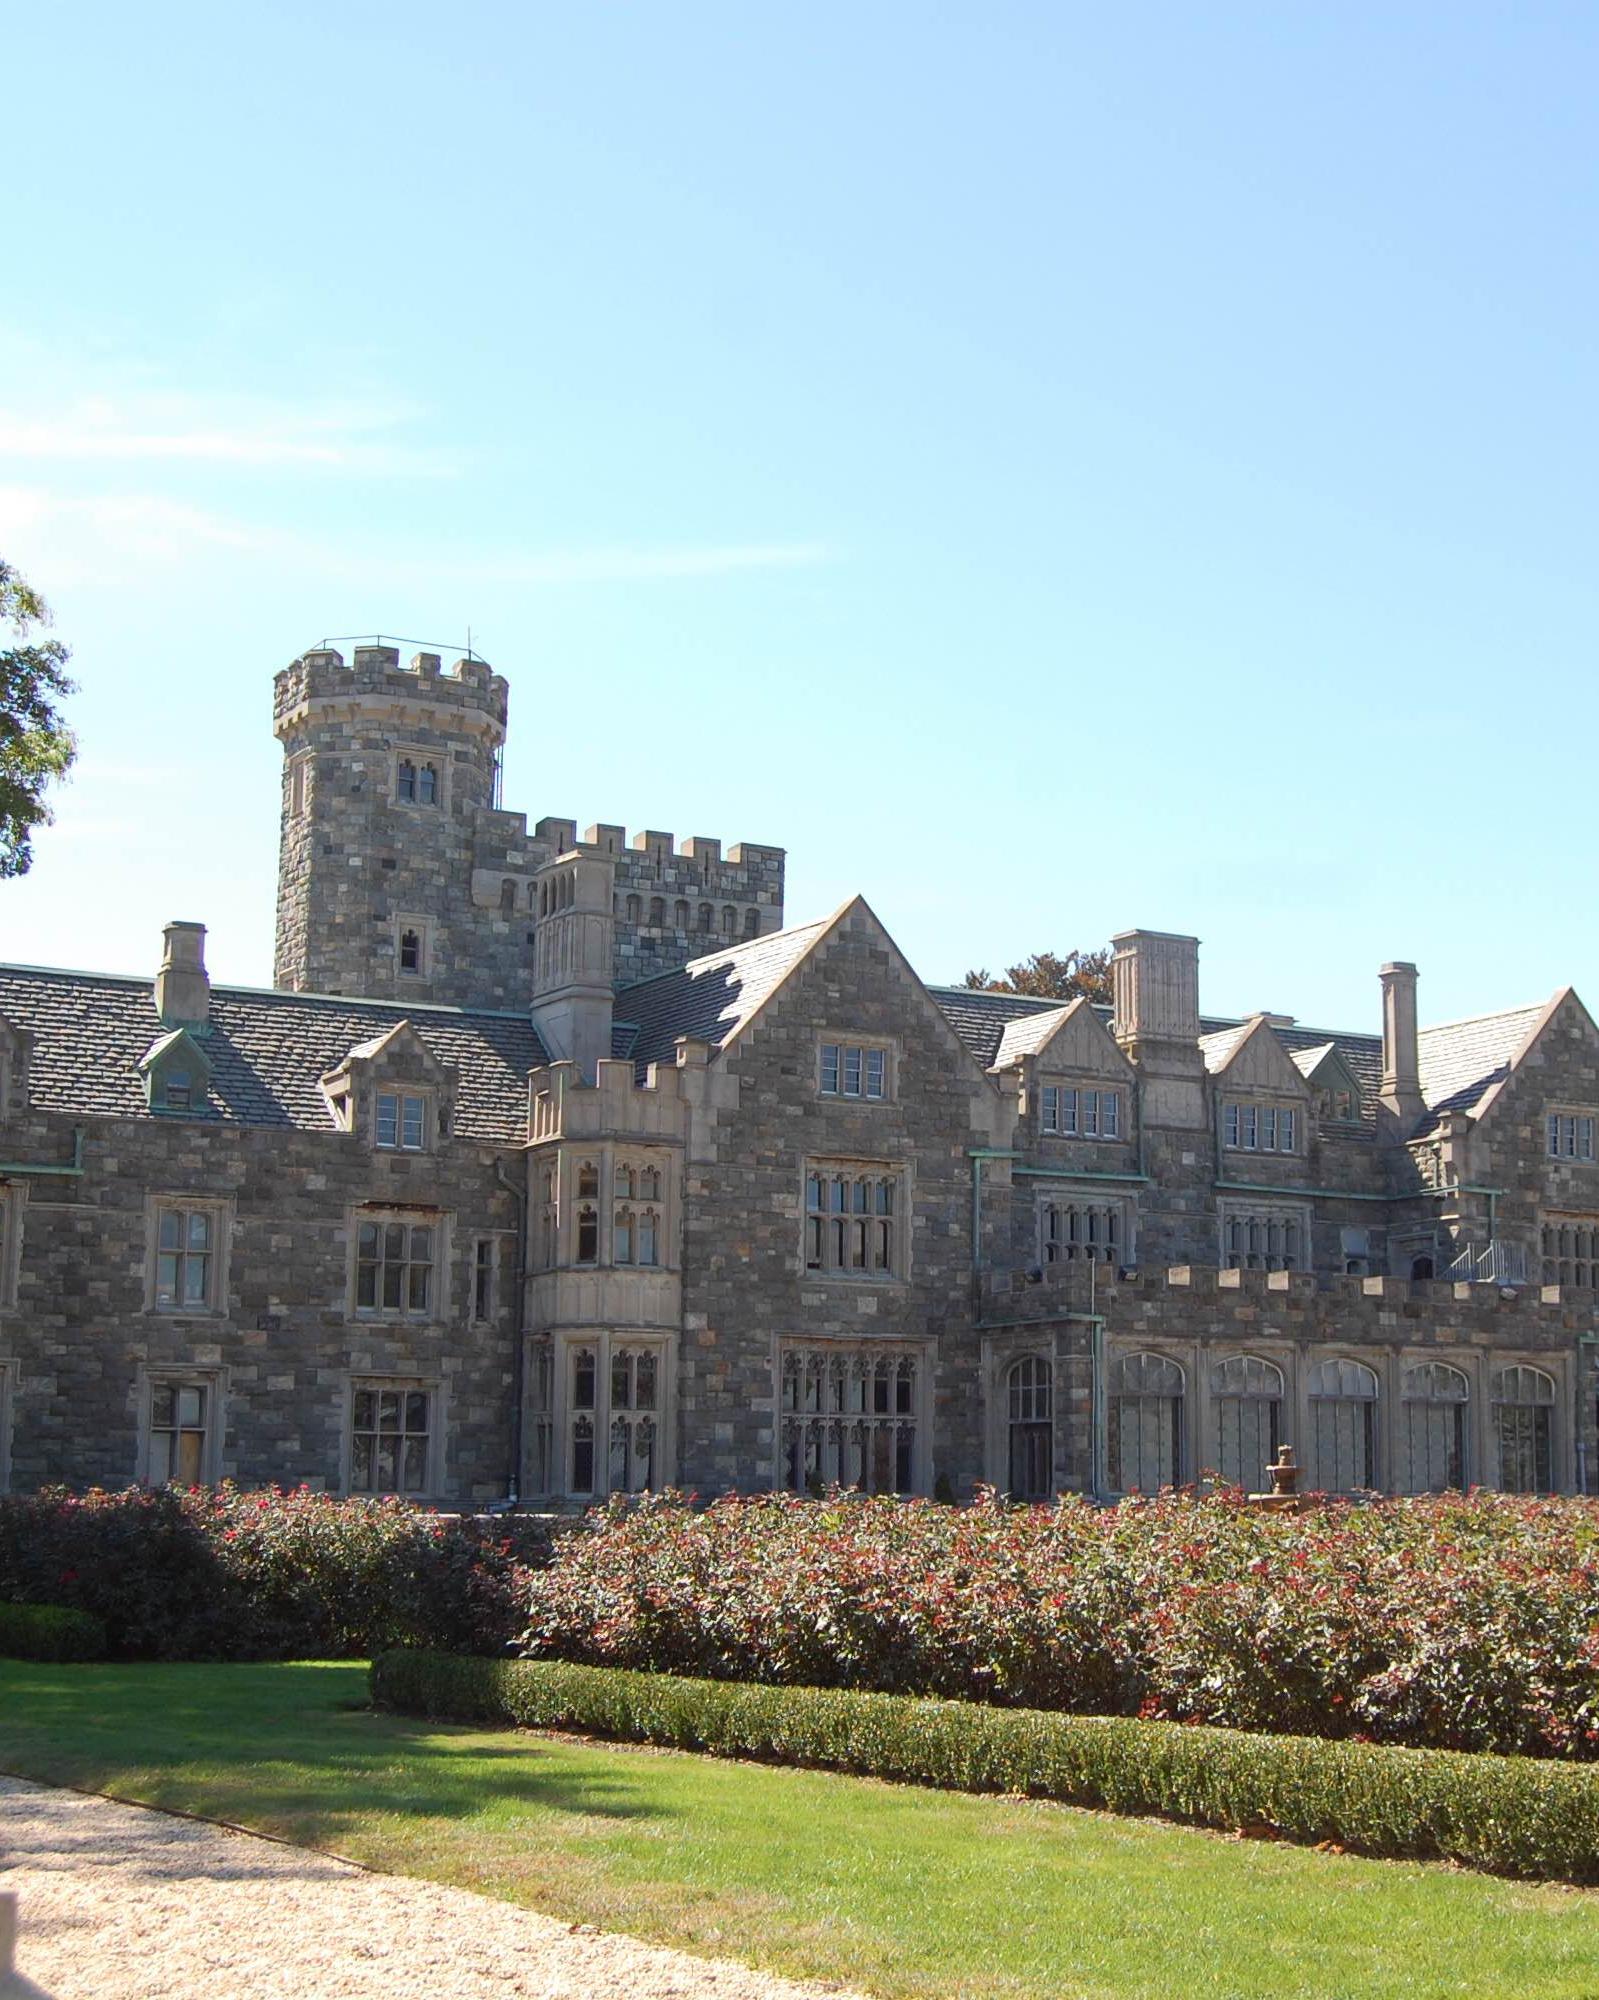 castle-wedding-venues-gould-hempstead-new-york-3417-0115.jpg